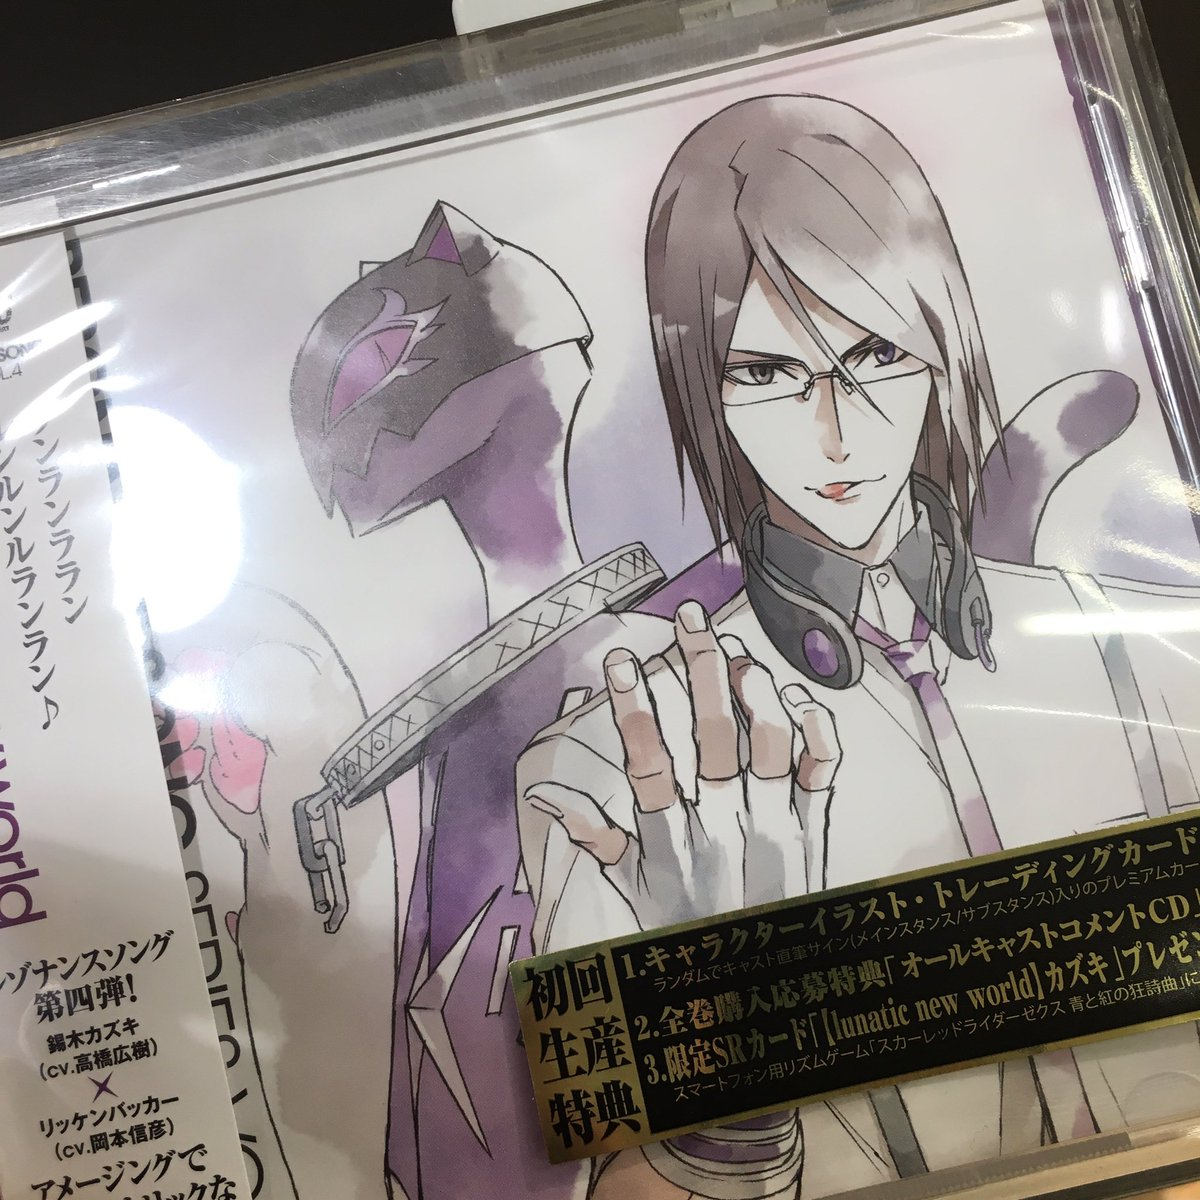 【TOWERanime梅田】本日はScared Rider Xechs 錫木カズキさんのお誕生日!アニメ化発表で会場の教